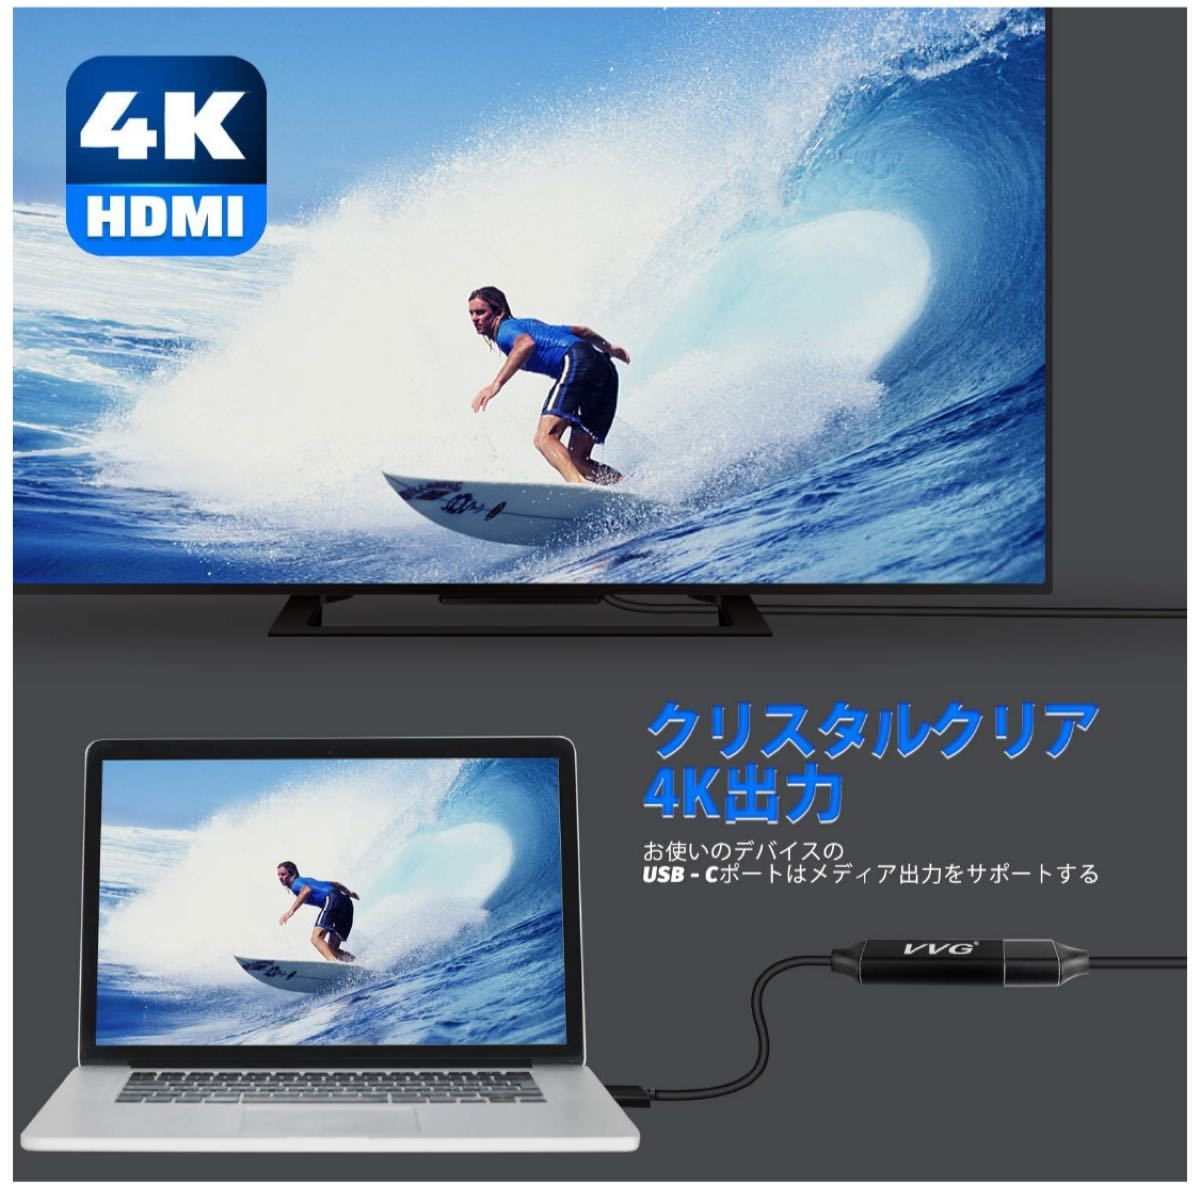 USB Type C to HDMI Adapter 変換ケーブルType-C(DP) to HDMIケーブル